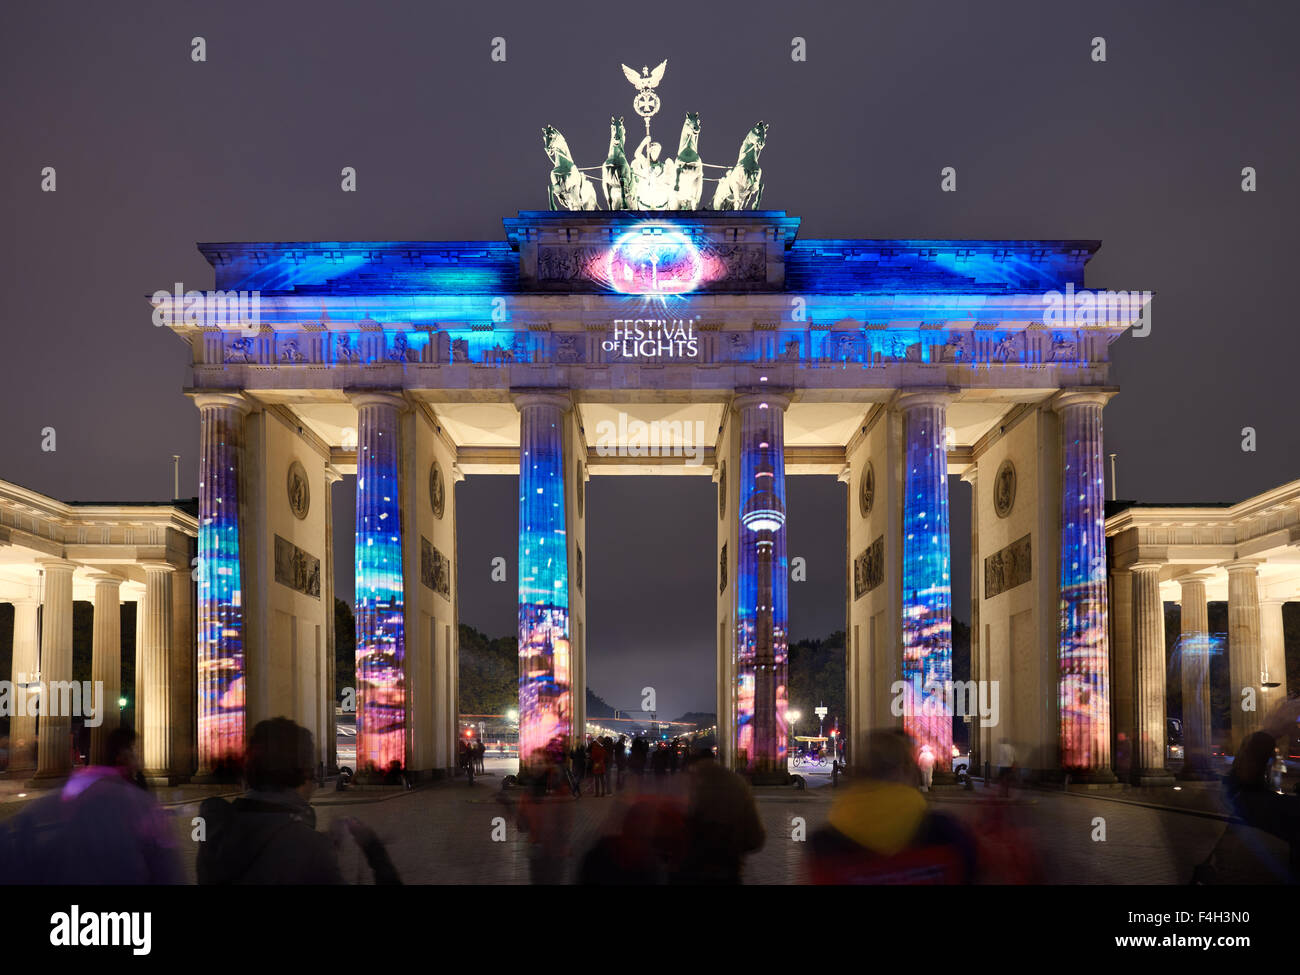 Berlin Festival Of Lights Brandenburger Tor Stock Photo Alamy